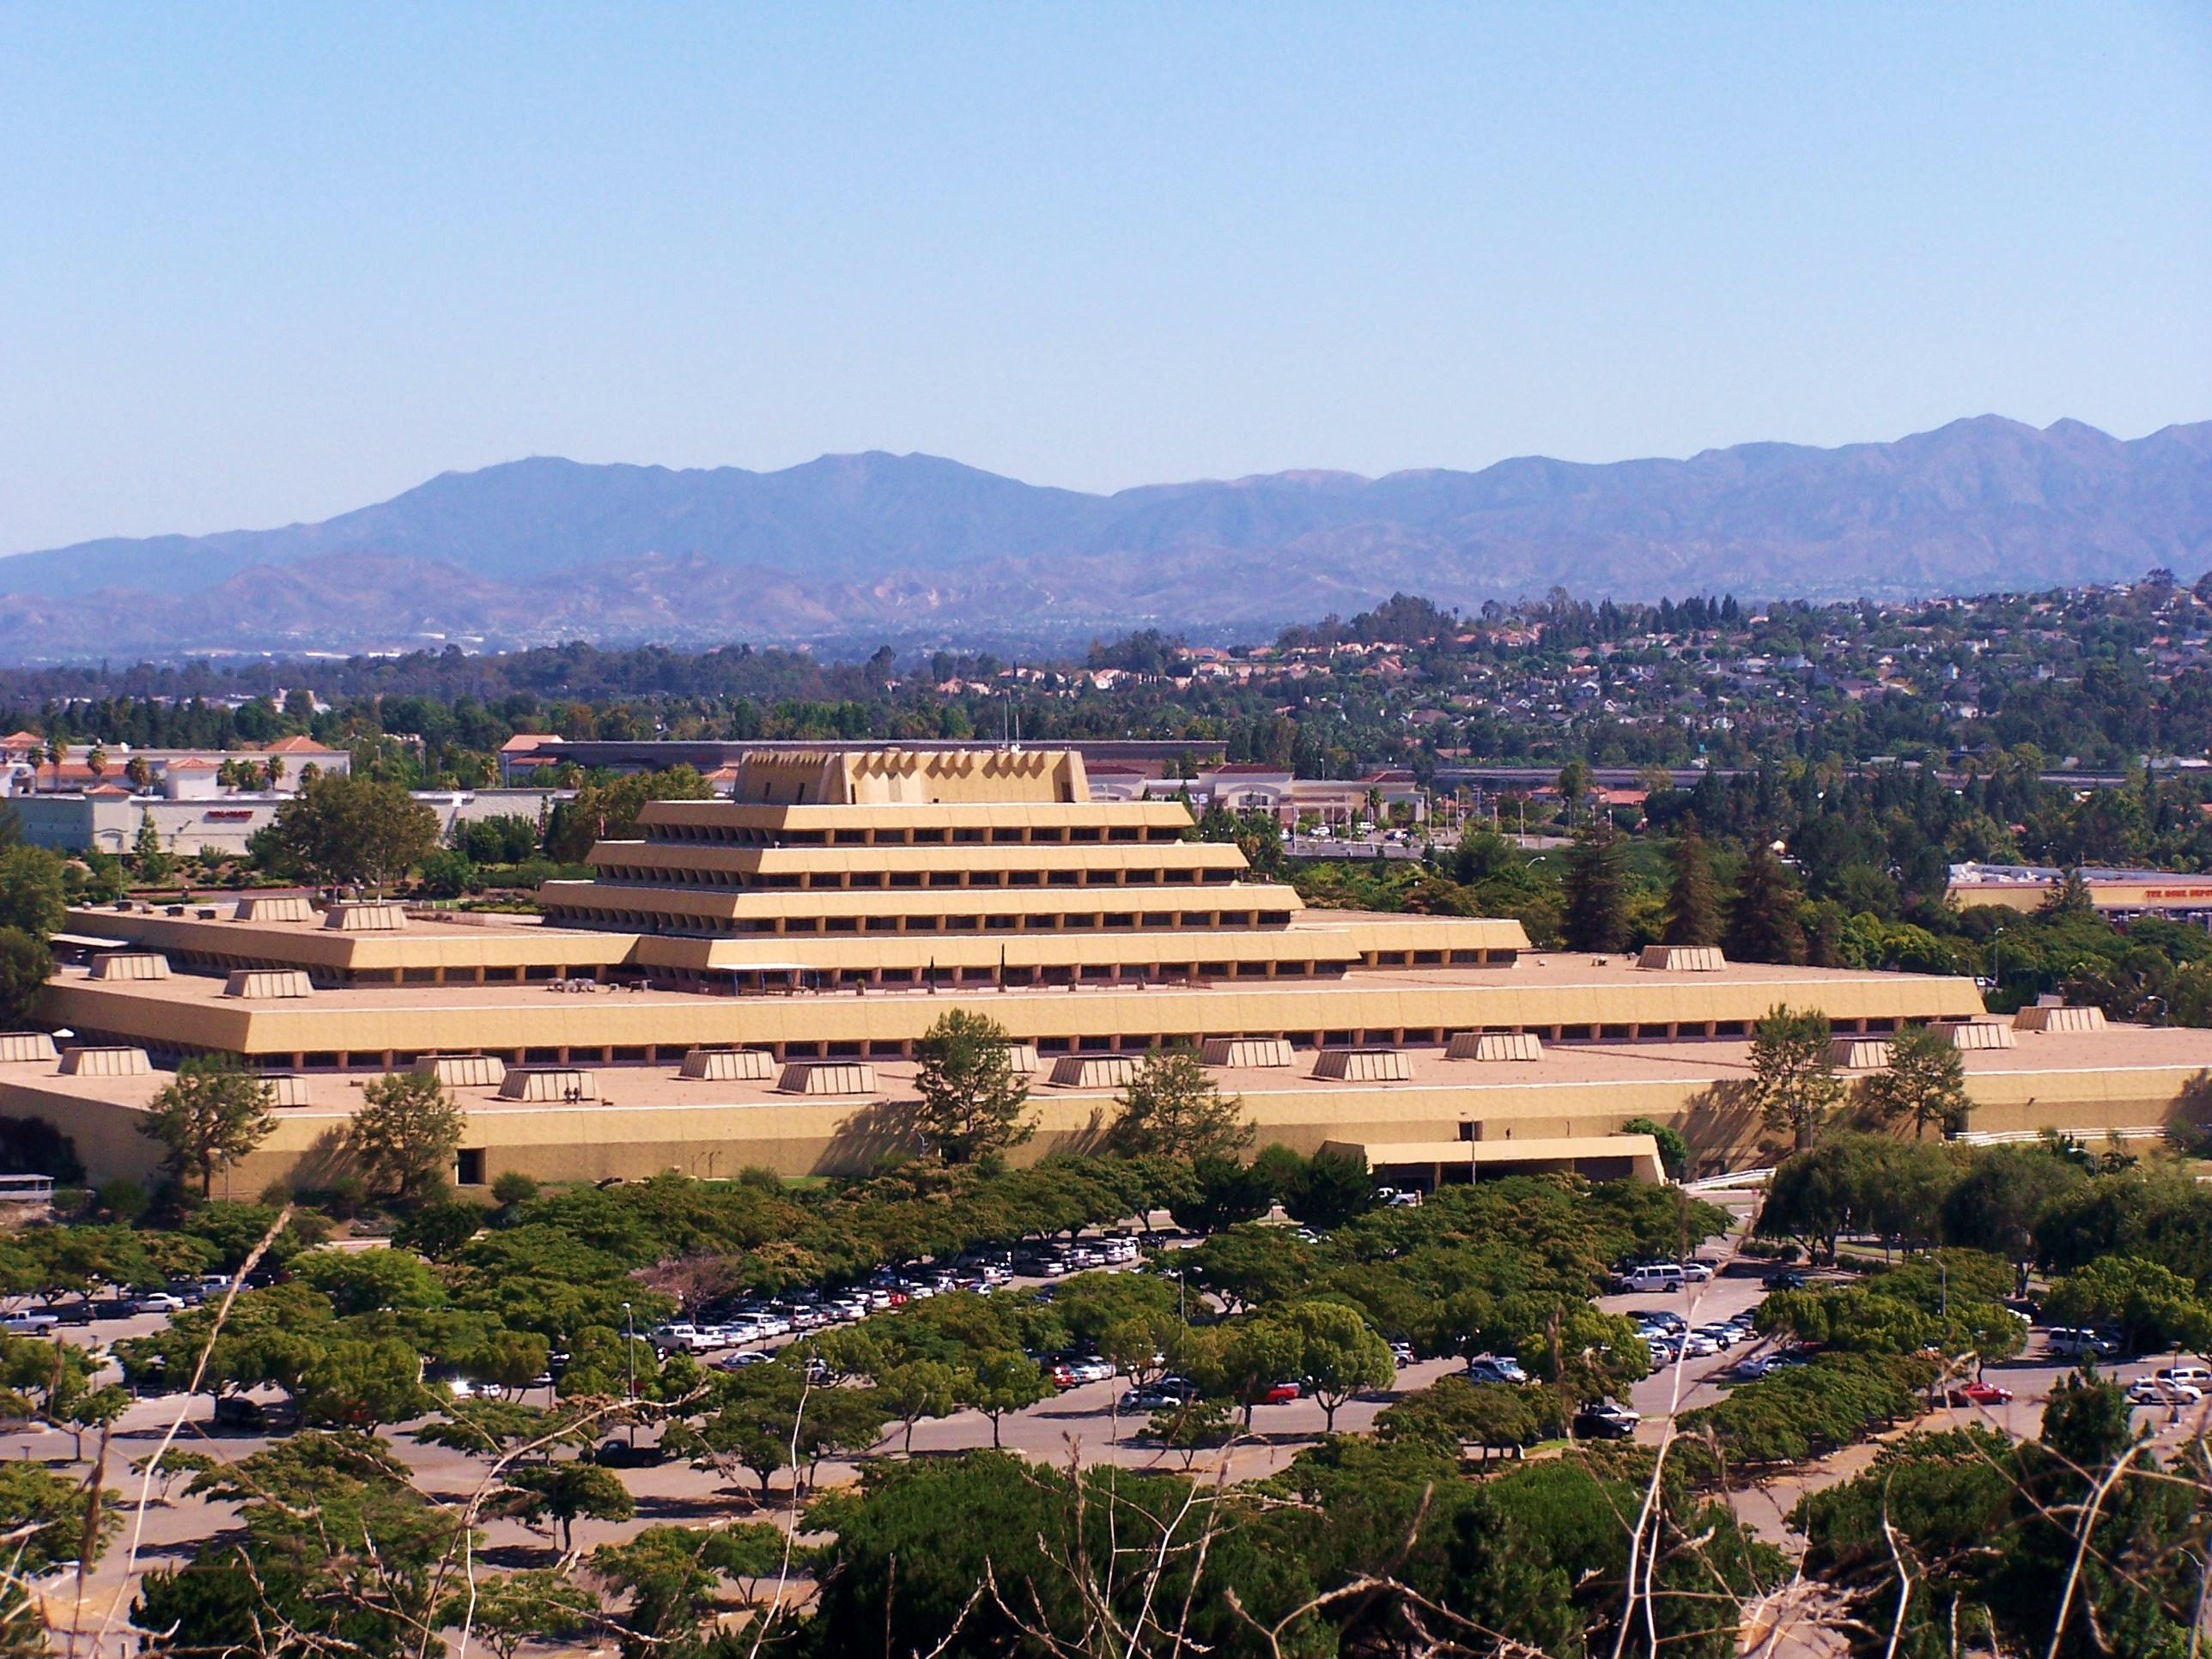 Chet Holifield Federal Building AKA The Ziggurat Building ...  Ziggurat Laguna Niguel